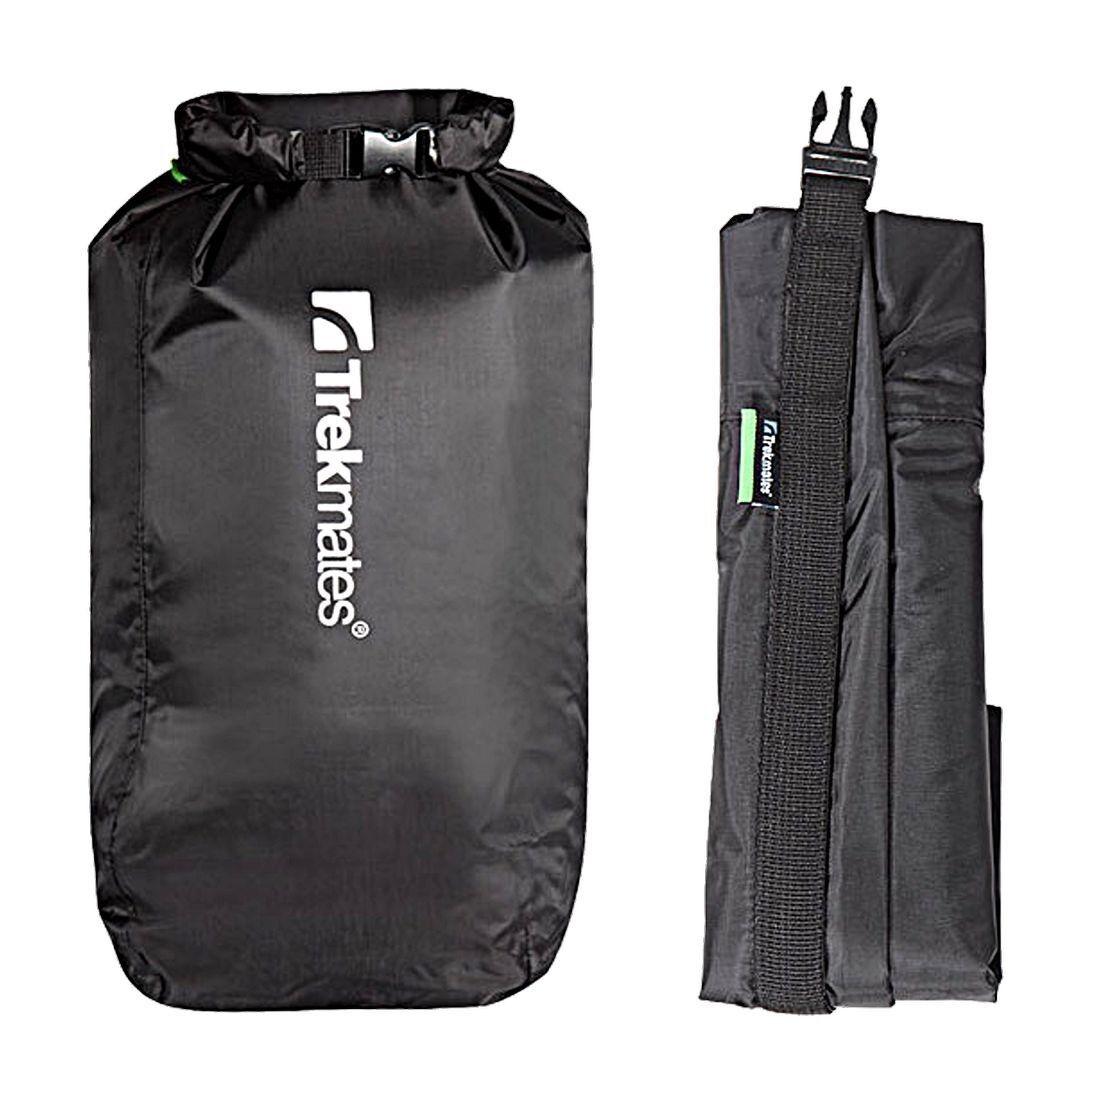 Trekmates Dry Bag 8L wasserdichter Packsack Packbeutel… | 05055053222348